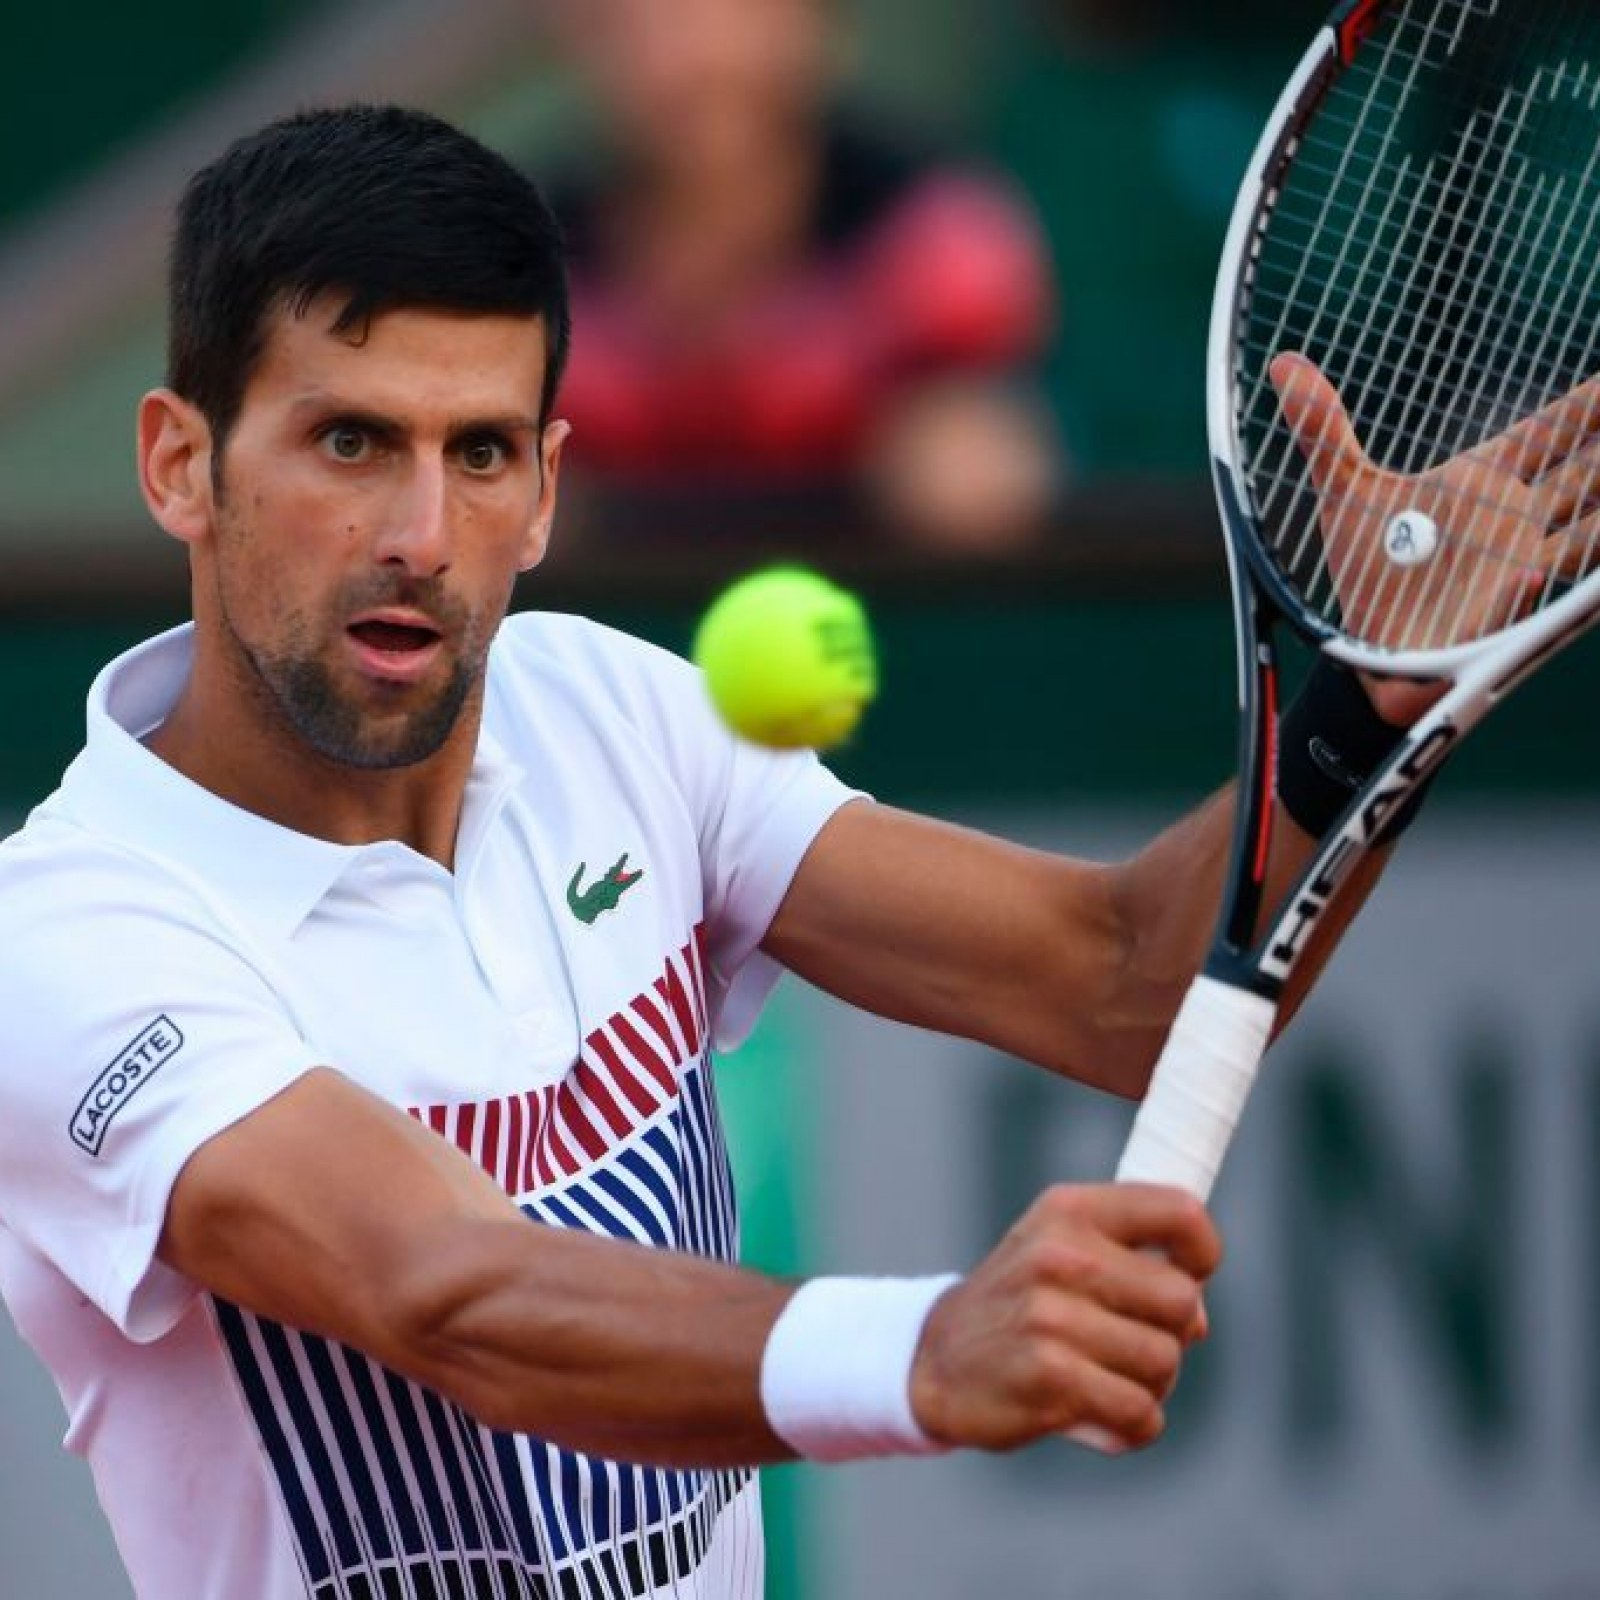 French Open 2017 Novak Djokovic Talks Wimbledon Plans After London Attacks